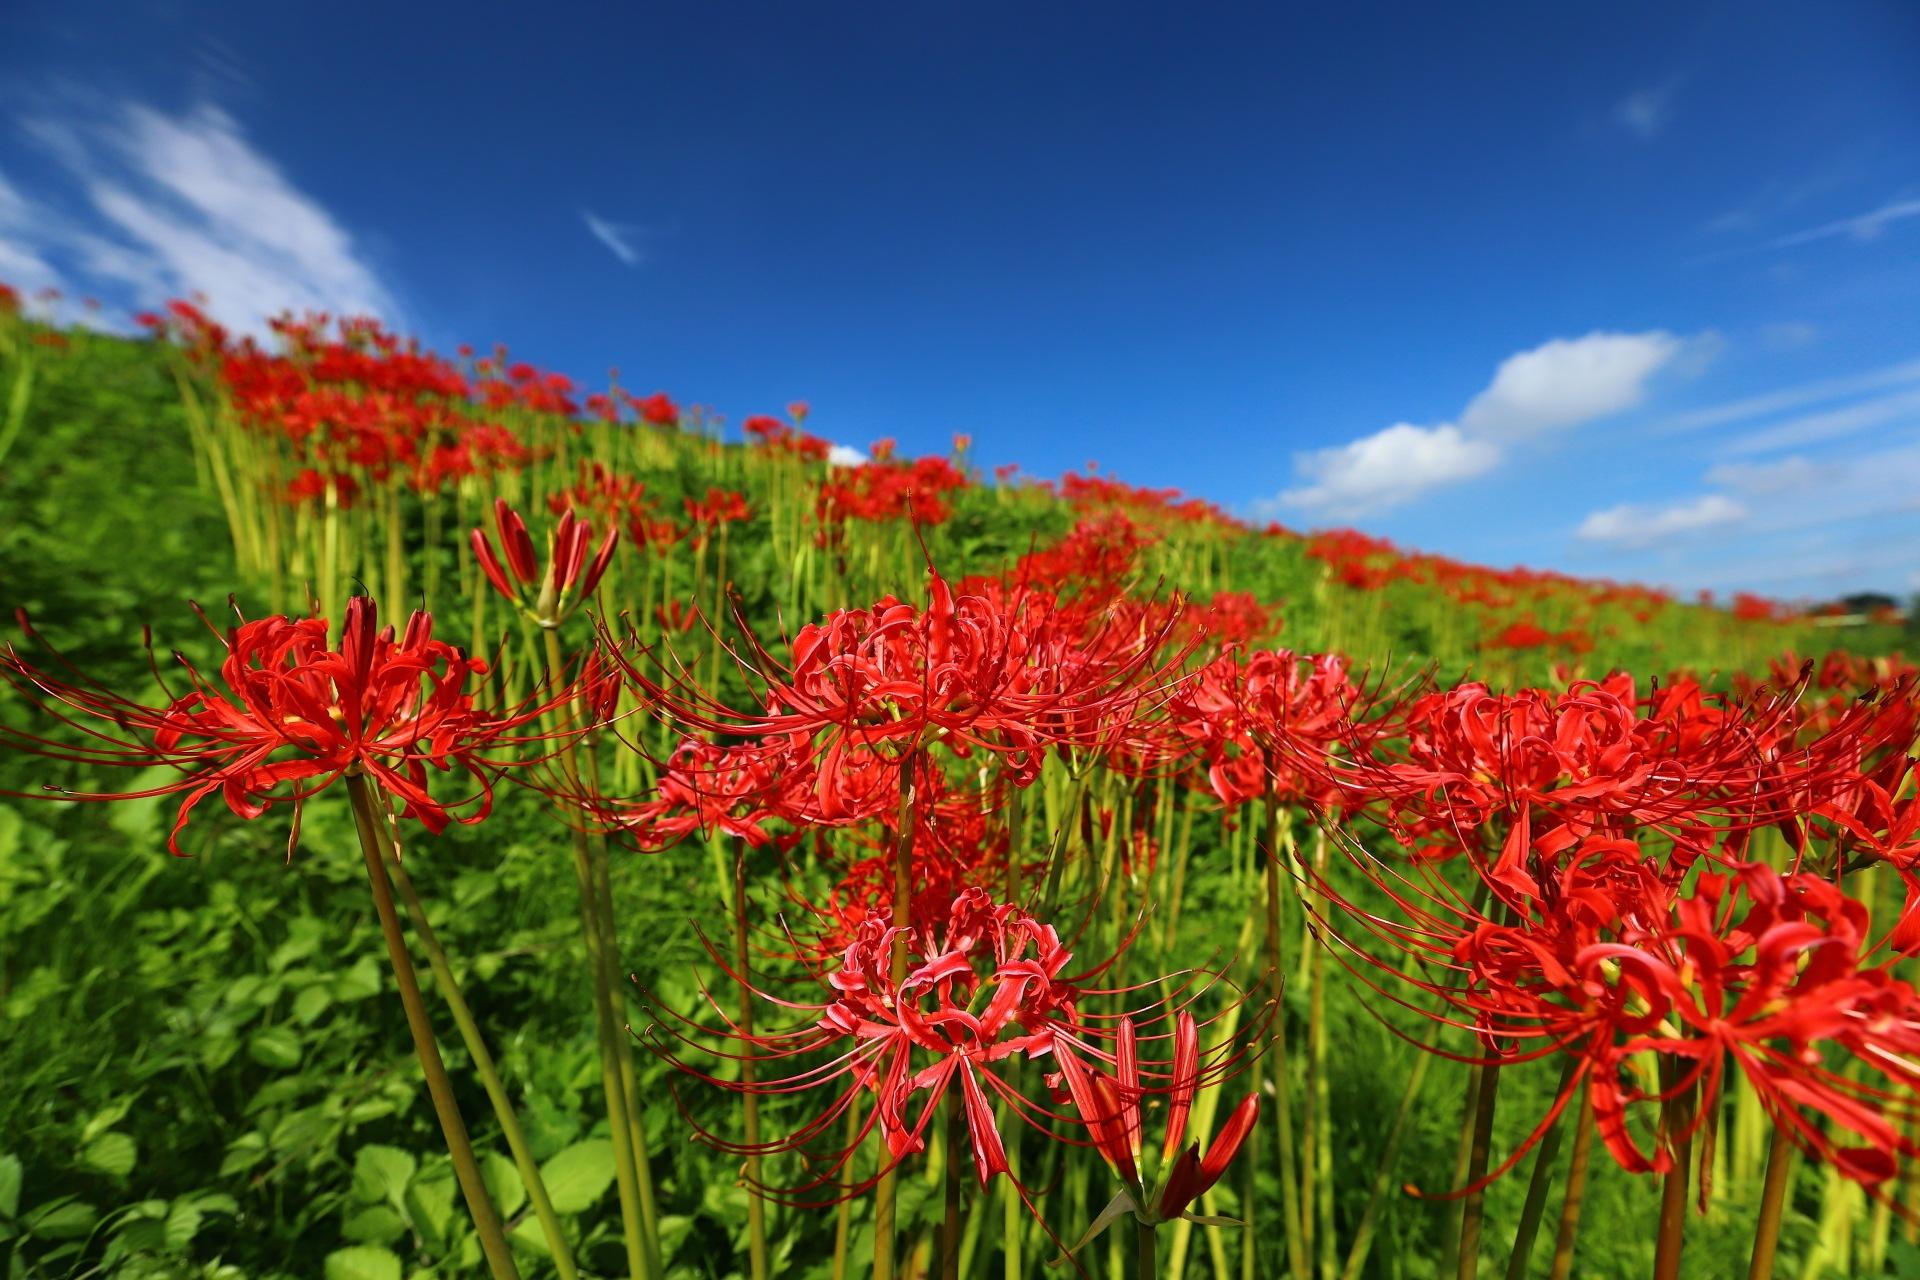 Sky, Bank, Red Spider Lily by takashi.mizoguchi